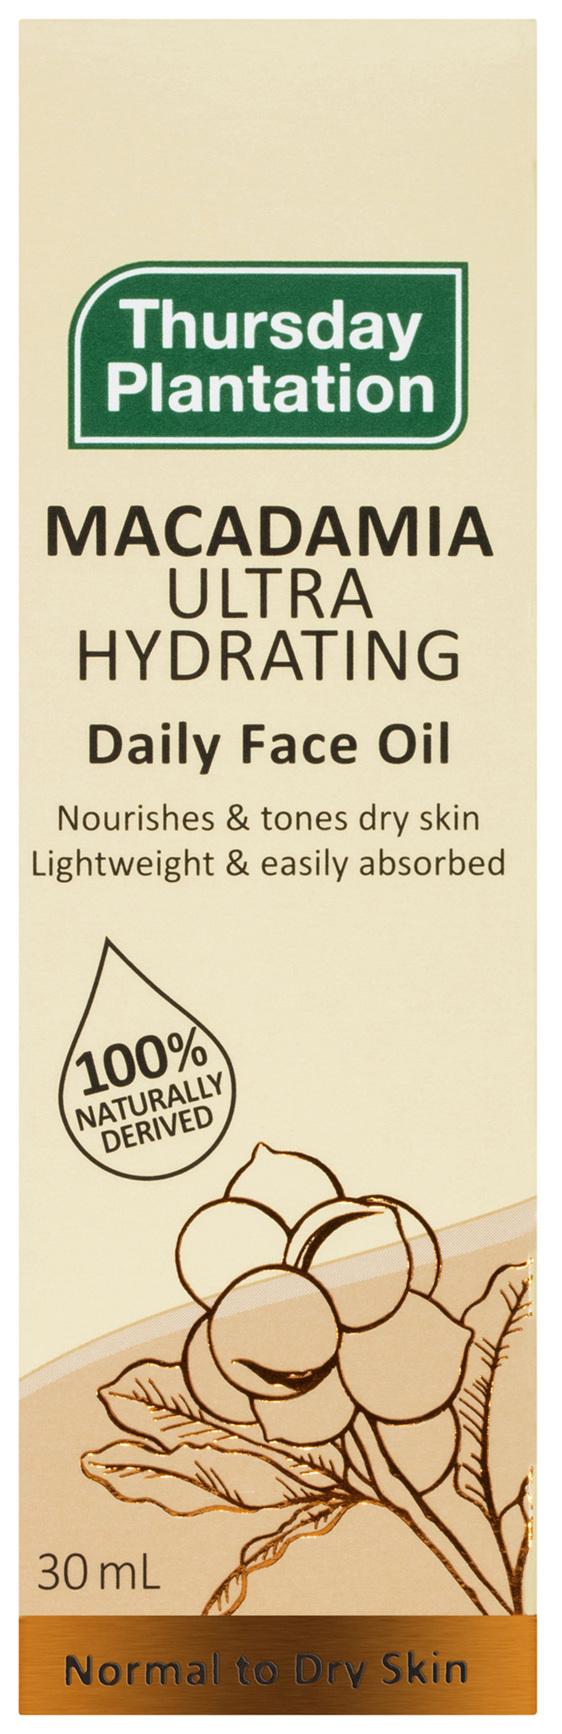 Thursday Plantation Macadamia Ultra Hydrating Daily Face Oil 30mL